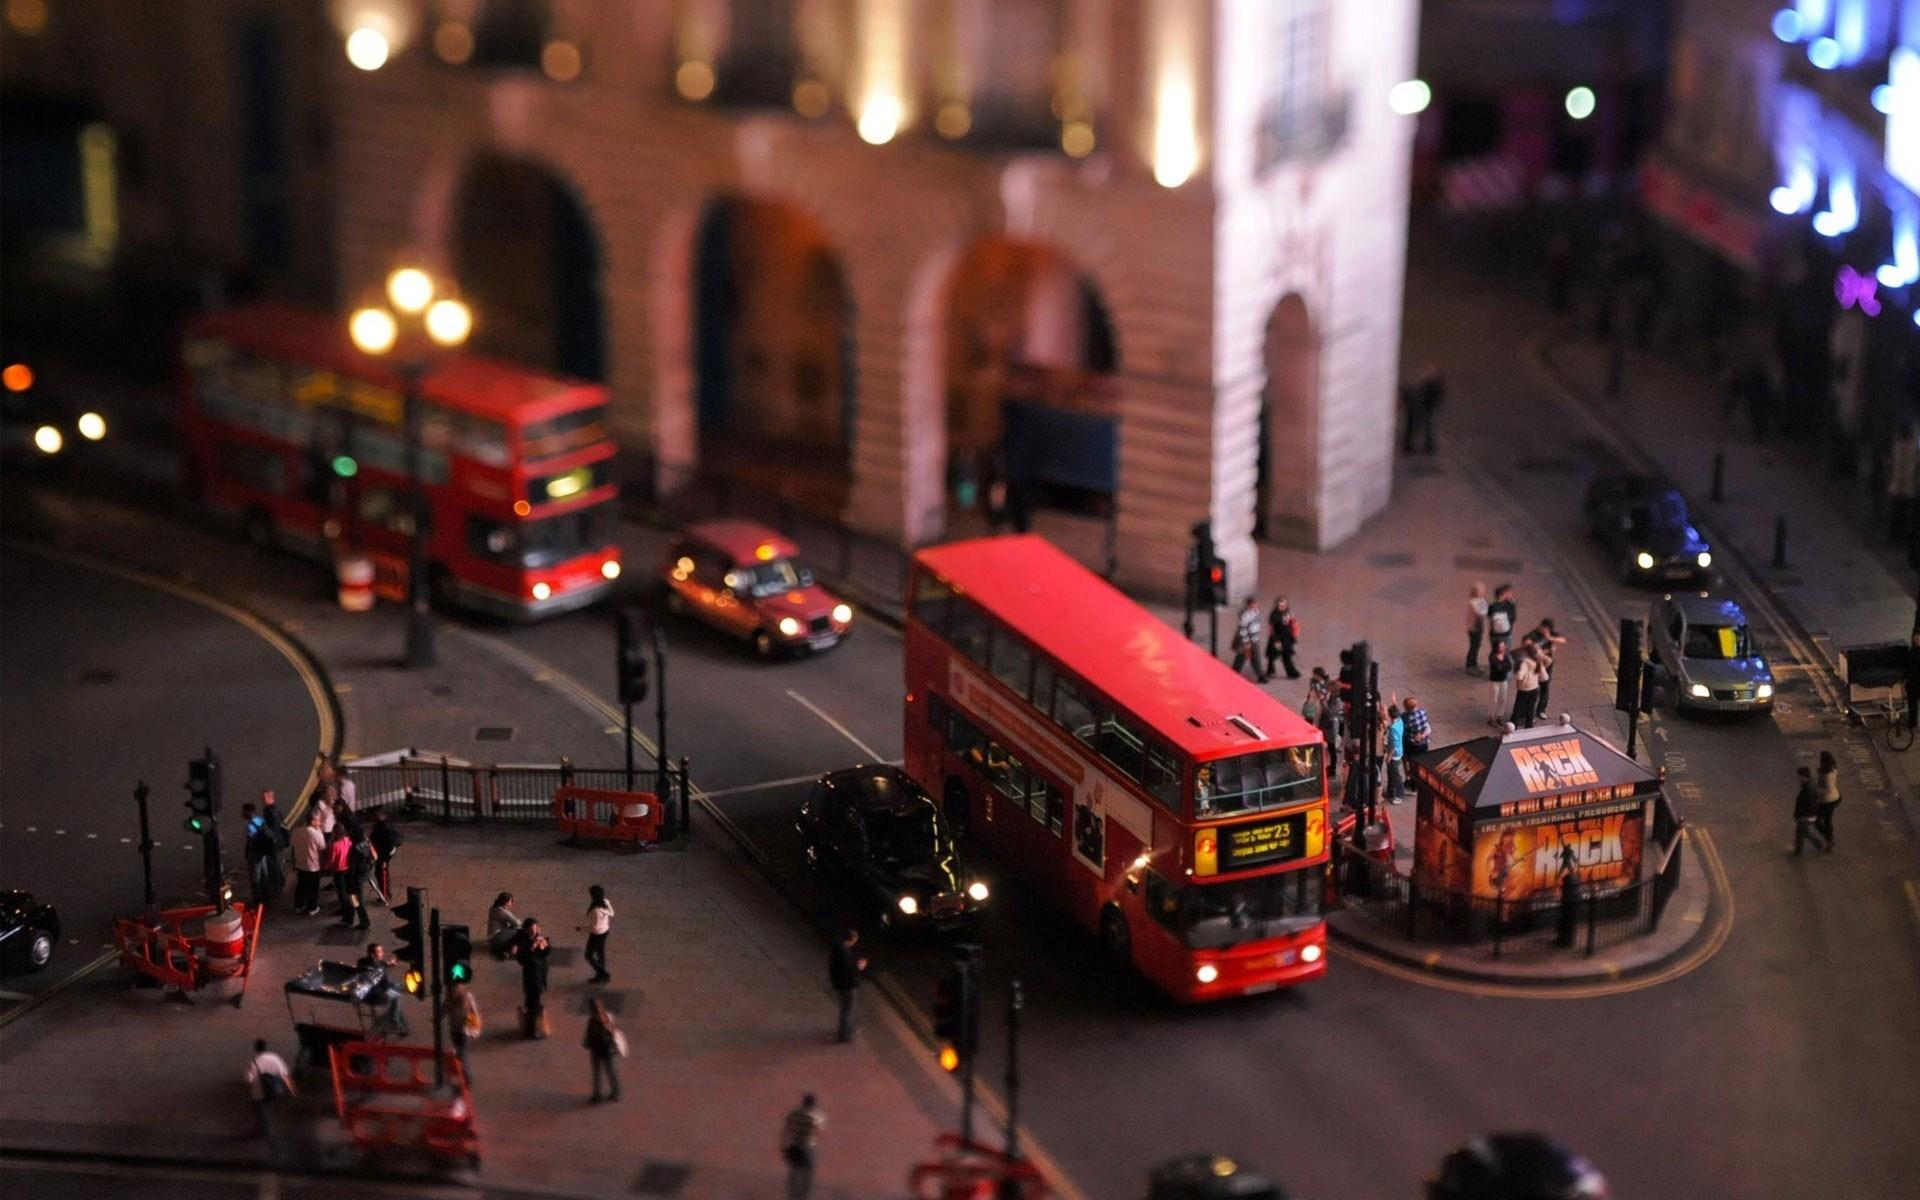 UK London Town Bus Tilt-Shift Photo